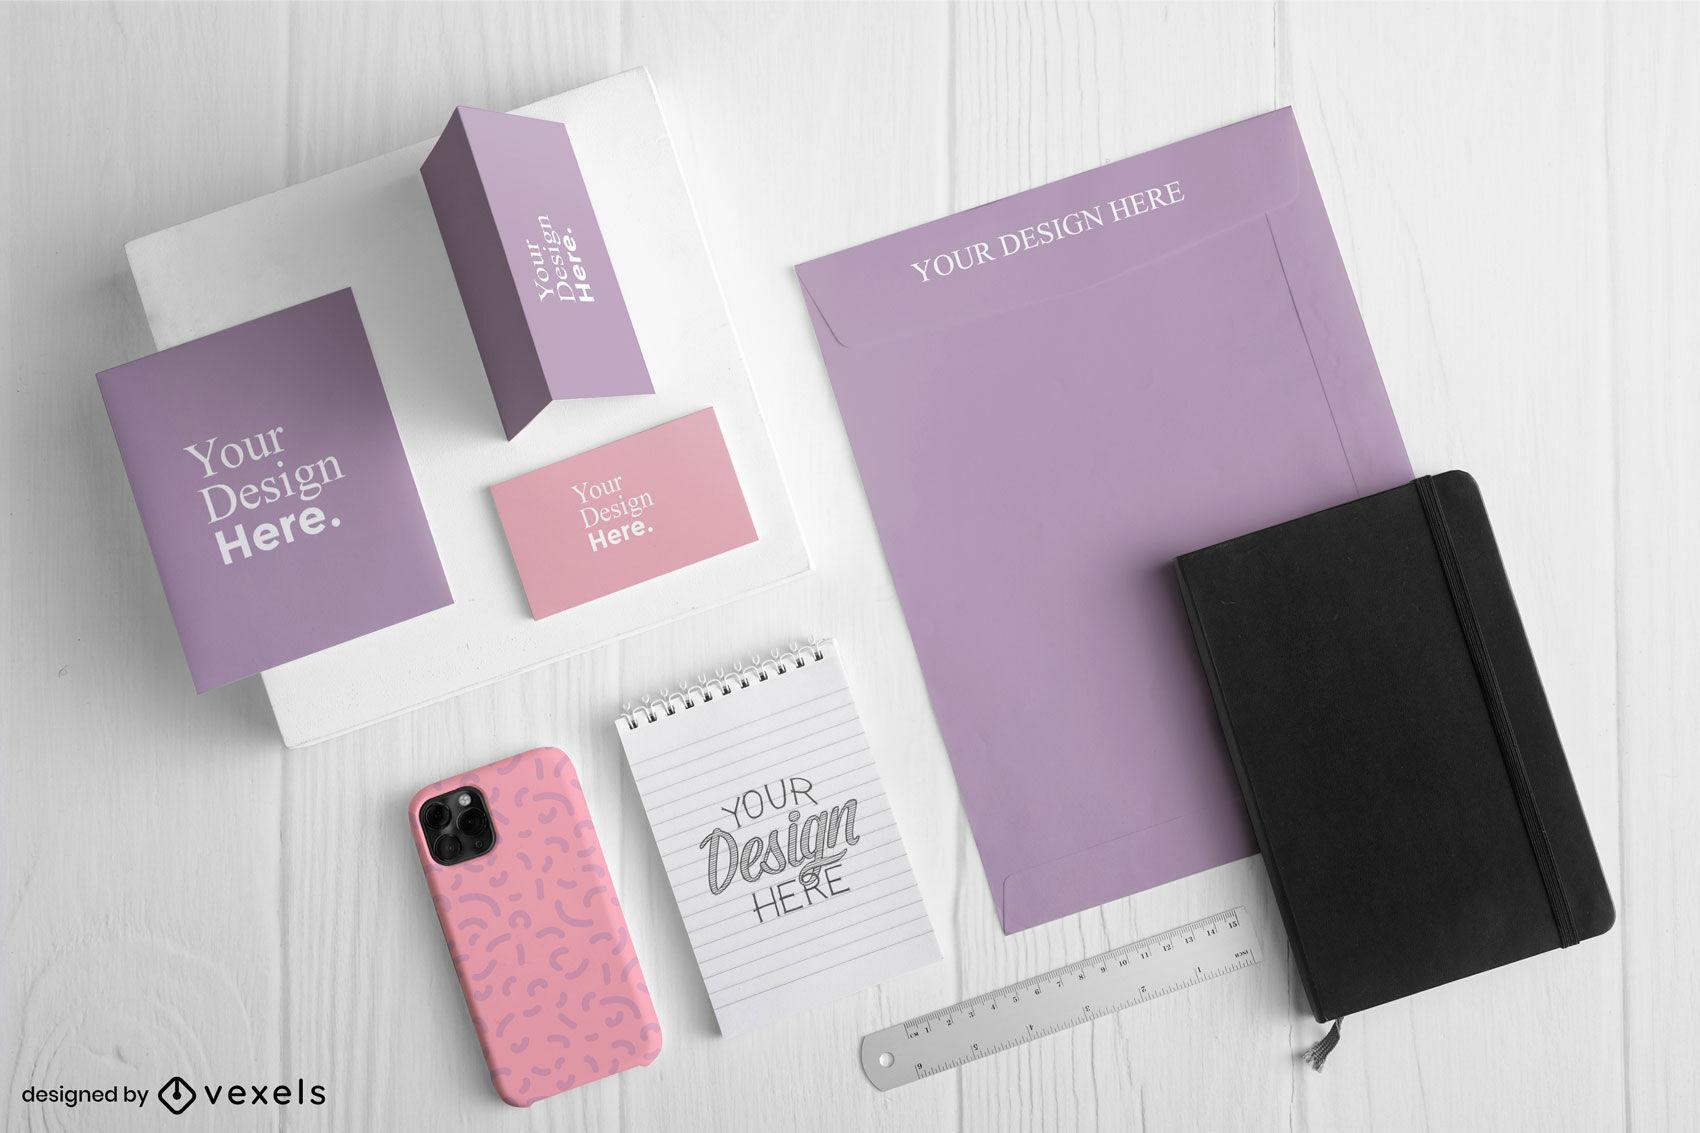 Pink and purple stationery branding kit mockup